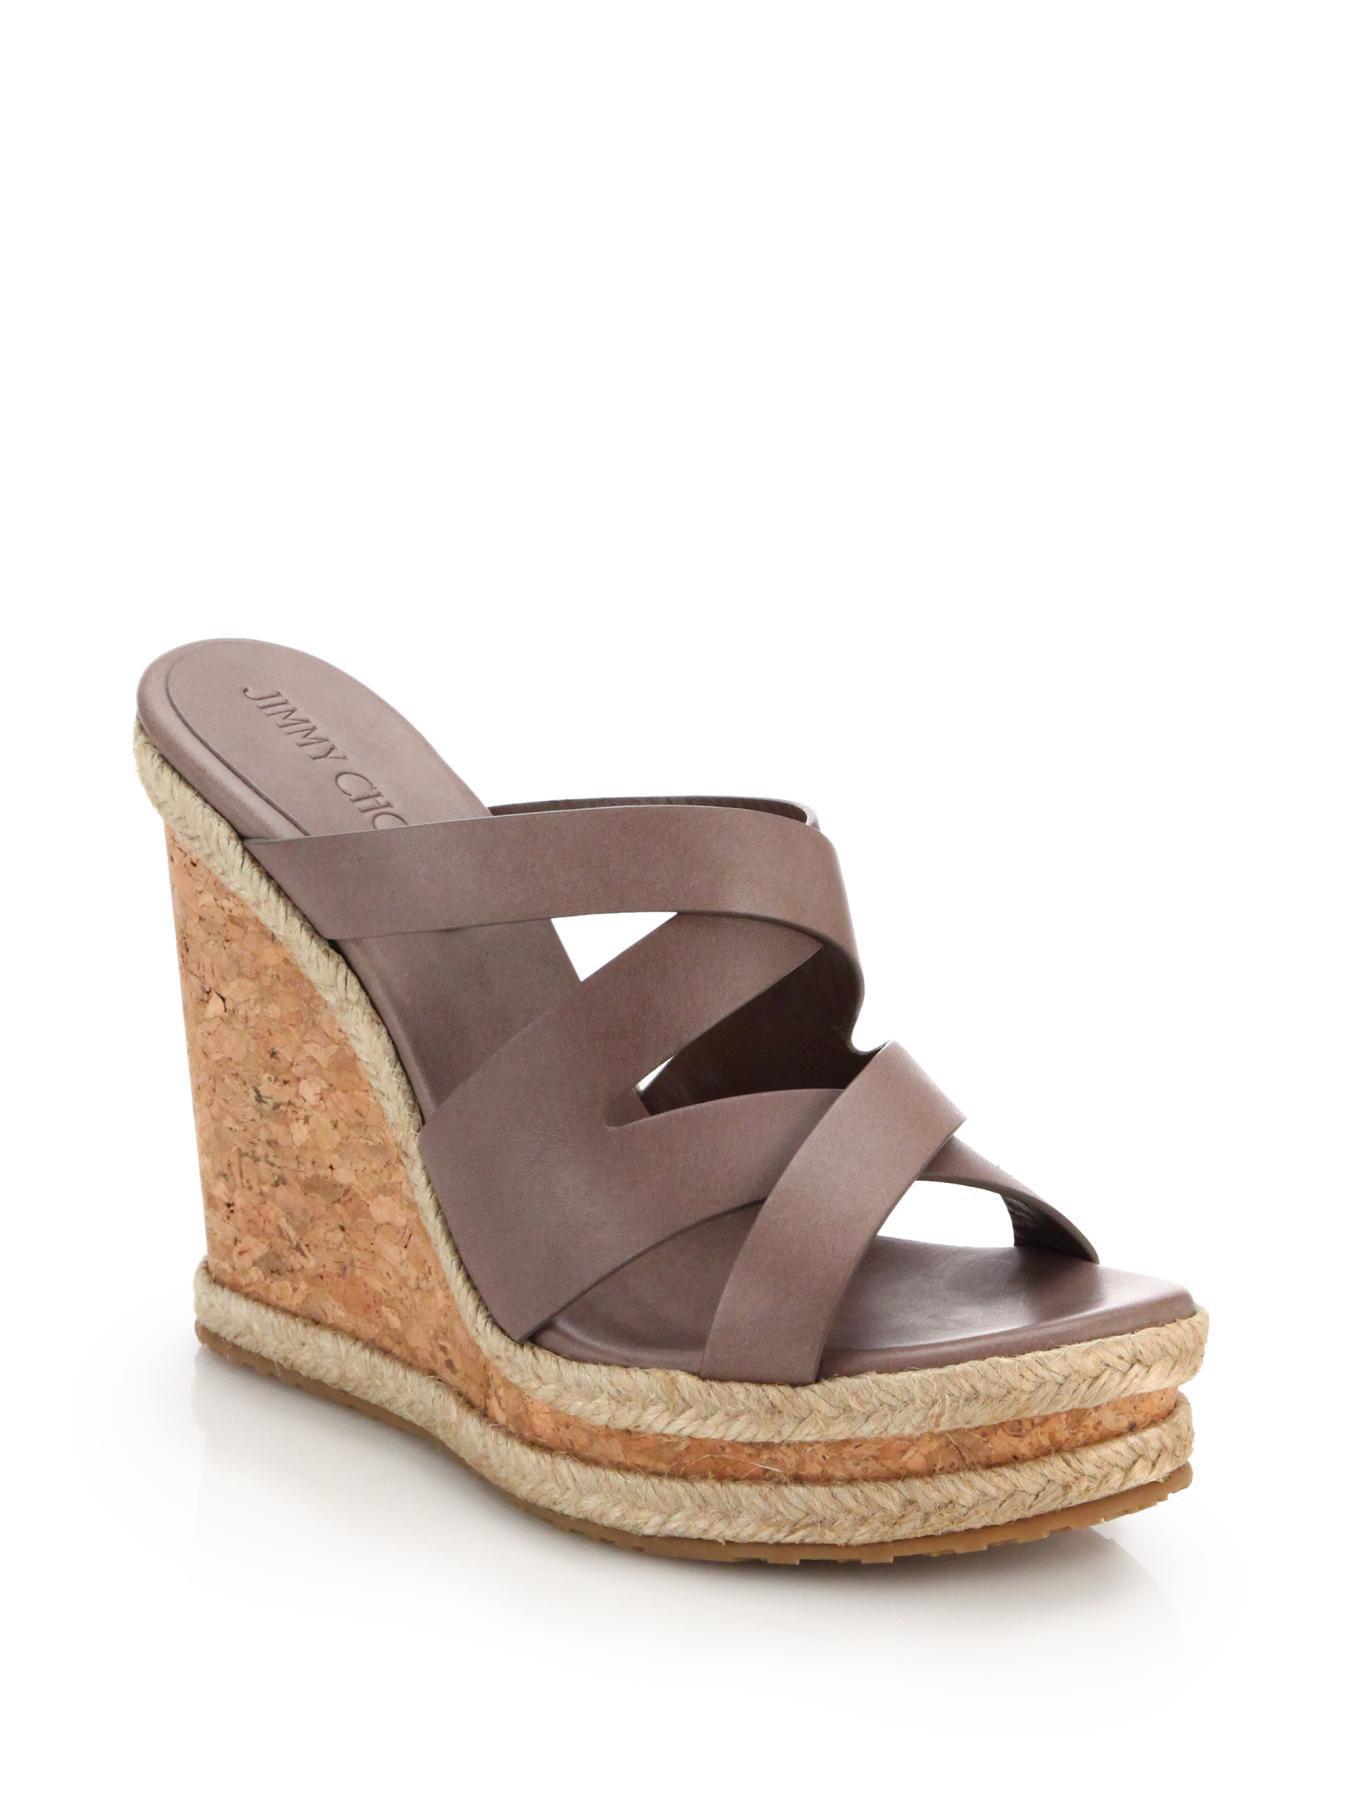 Jimmy Choo Mens Designer Brown Leather Shoes